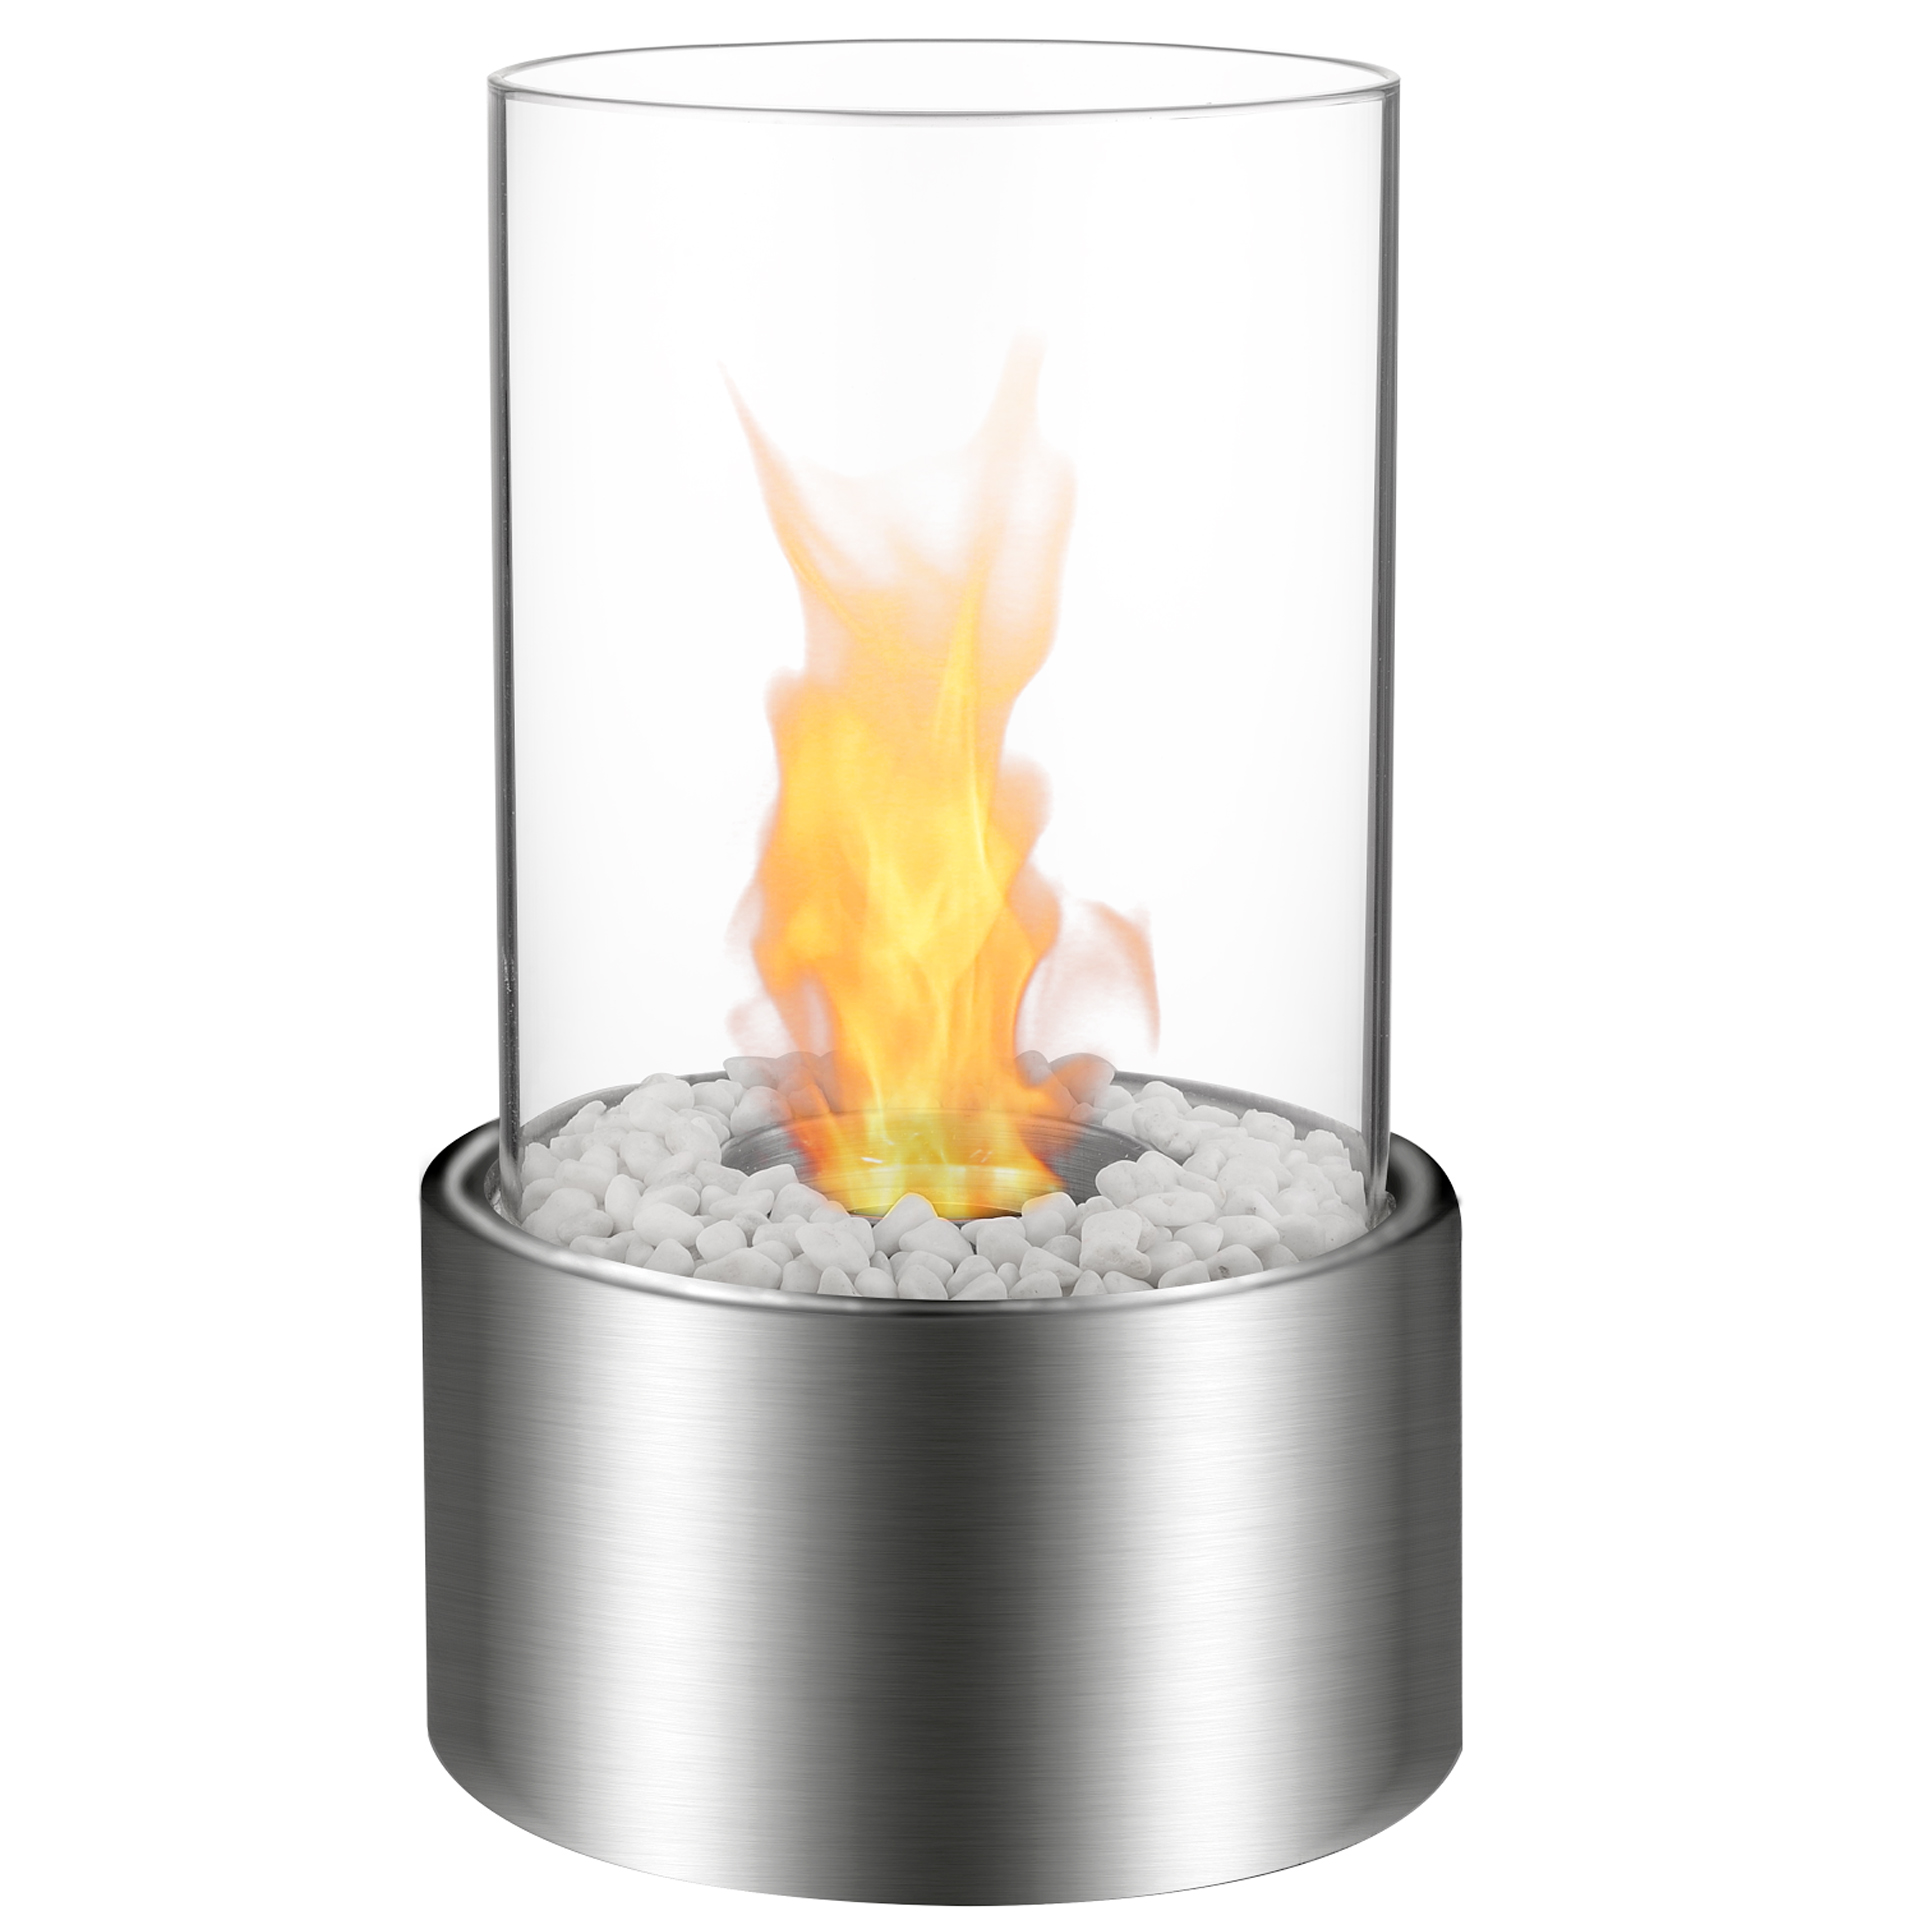 Eden Ventless Tabletop Portable Bio Ethanol Fireplace In